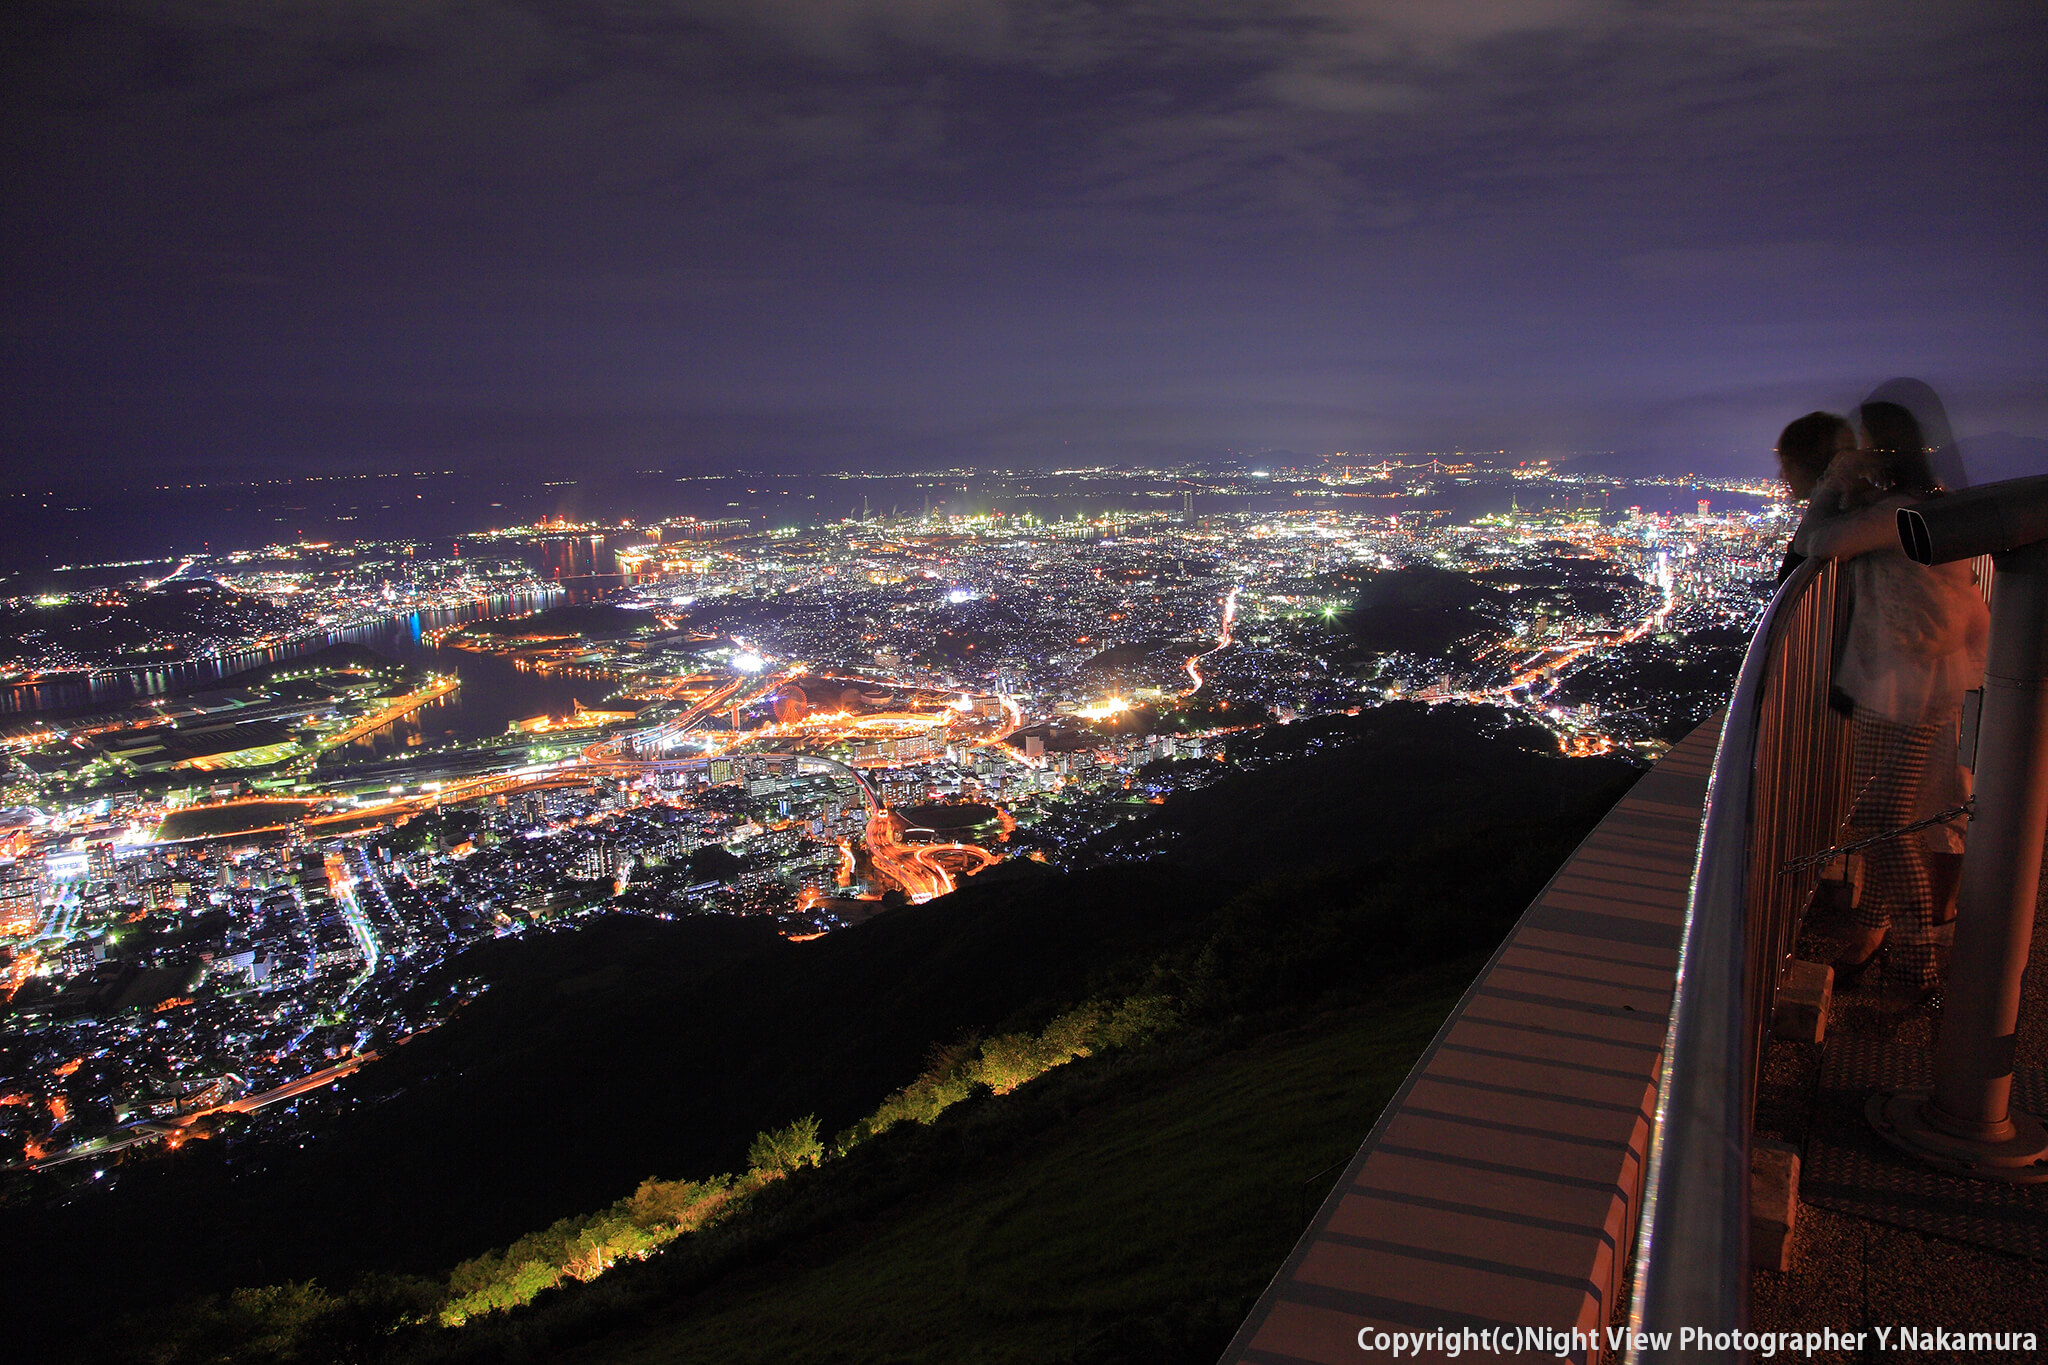 Photo of 北九州から下関まで望める大パノラマ!工場夜景も一望できる「皿倉山展望台」